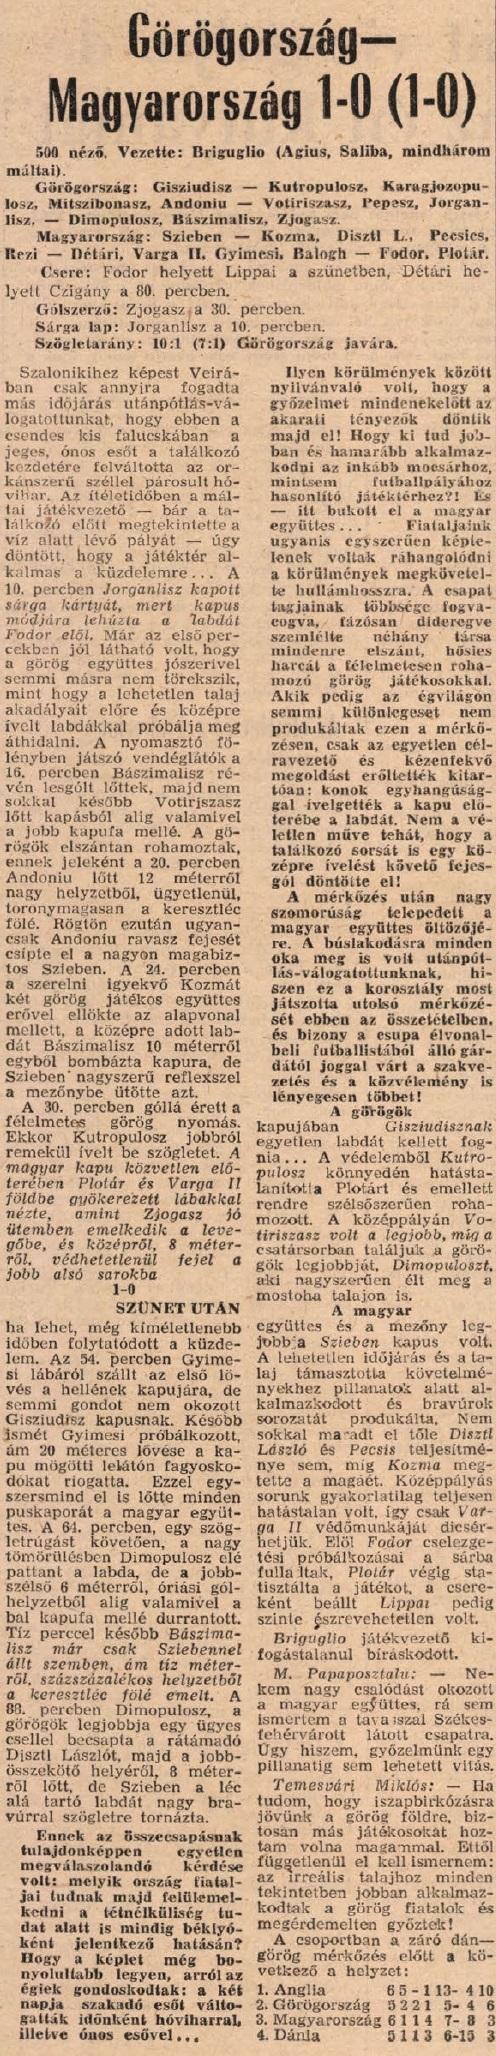 idokapszula_nb_i_1983_84_gorogorszag_magyarorszag_eb-selejtezo_utanpotlas.jpg